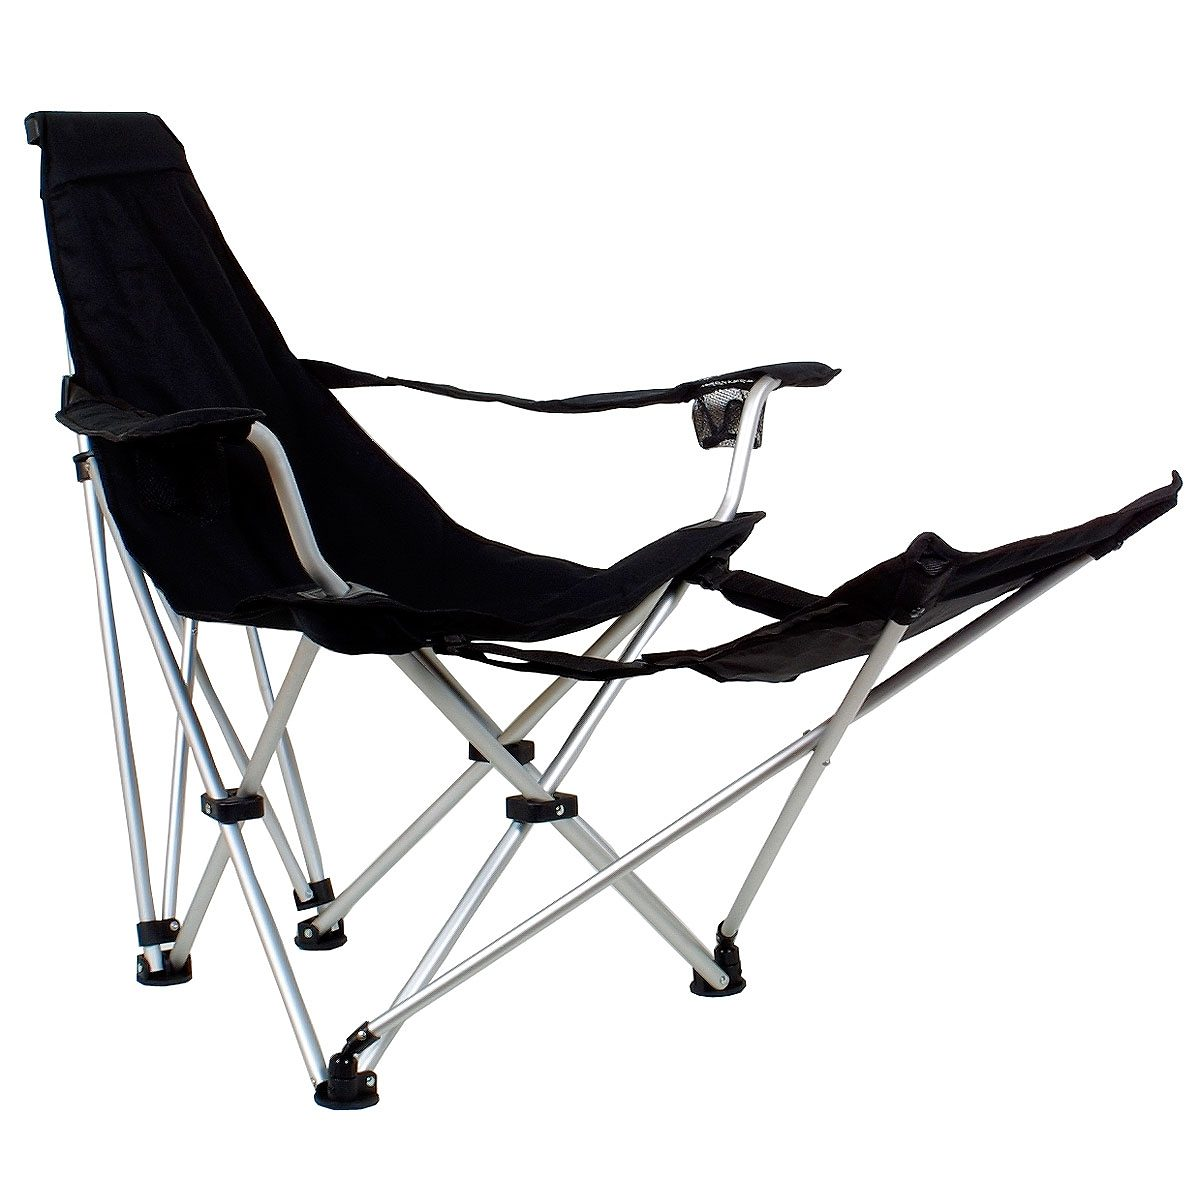 Relags Camping-Stuhl »Travelchair SunChair«